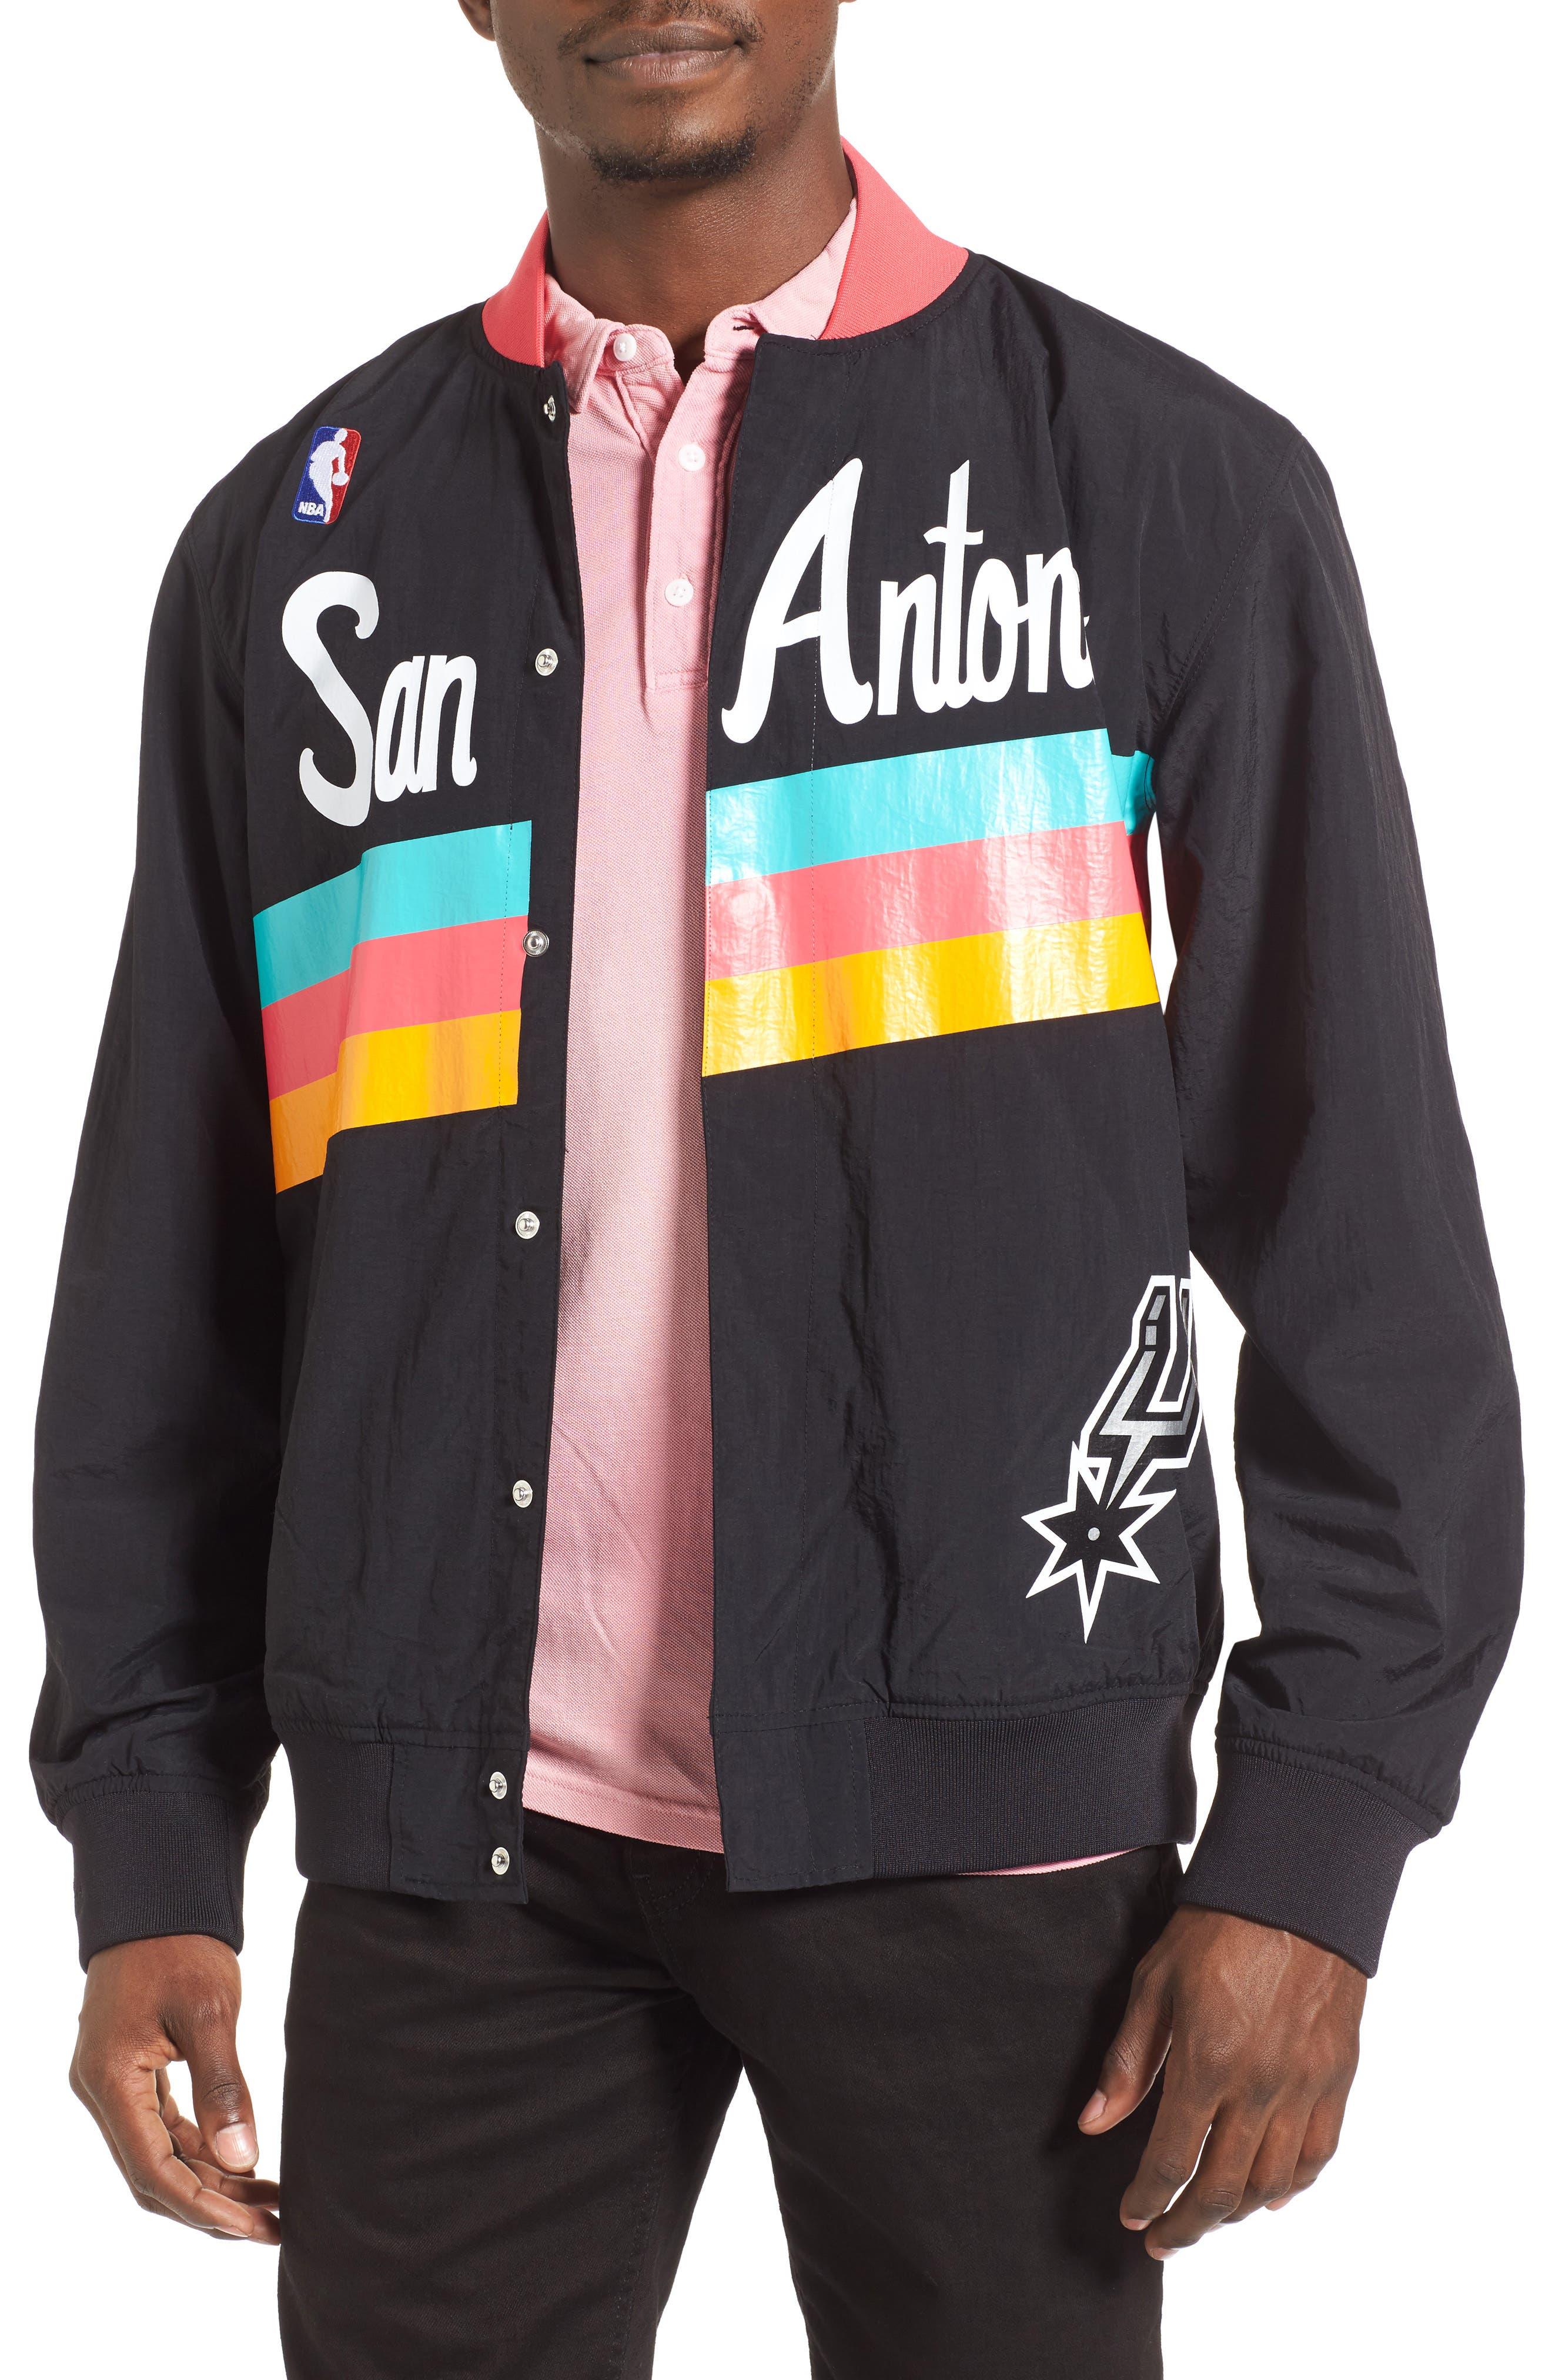 MITCHELL & NESS,                             'San Antonio Spurs' Warm-Up Jacket,                             Alternate thumbnail 2, color,                             001